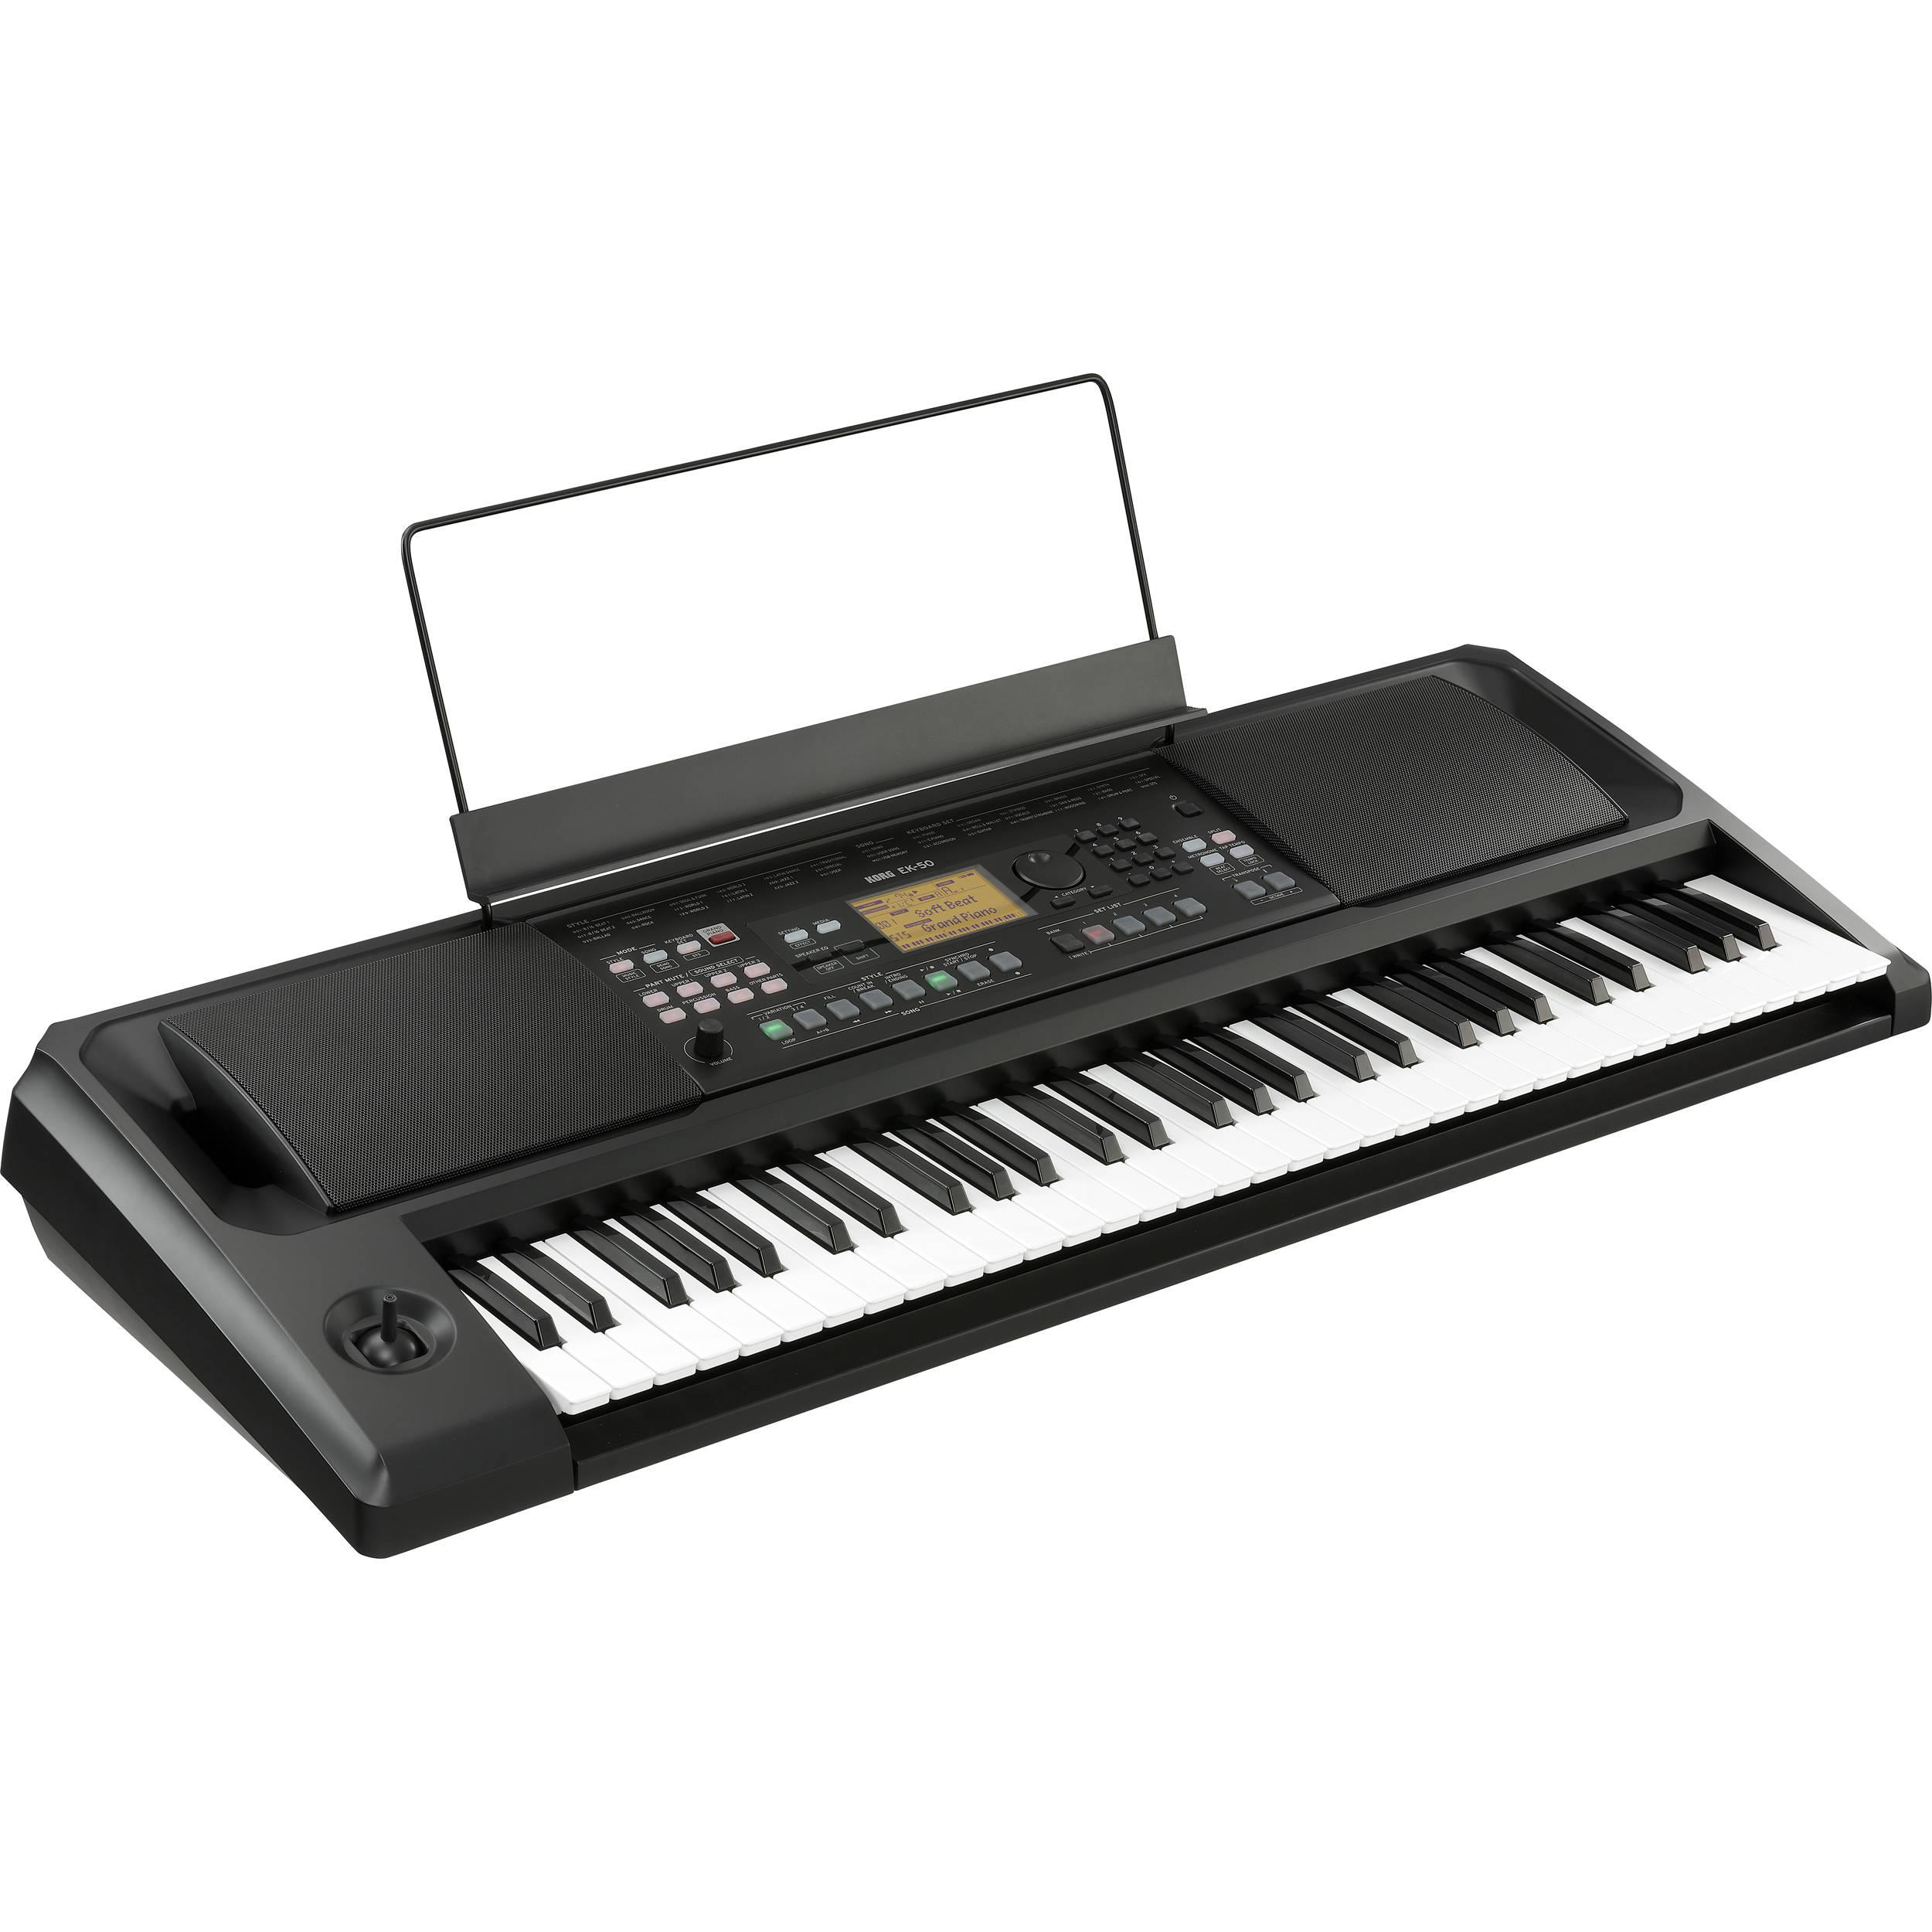 Korg EK-50 61-Key Arranger Keyboard with Built-In Speakers